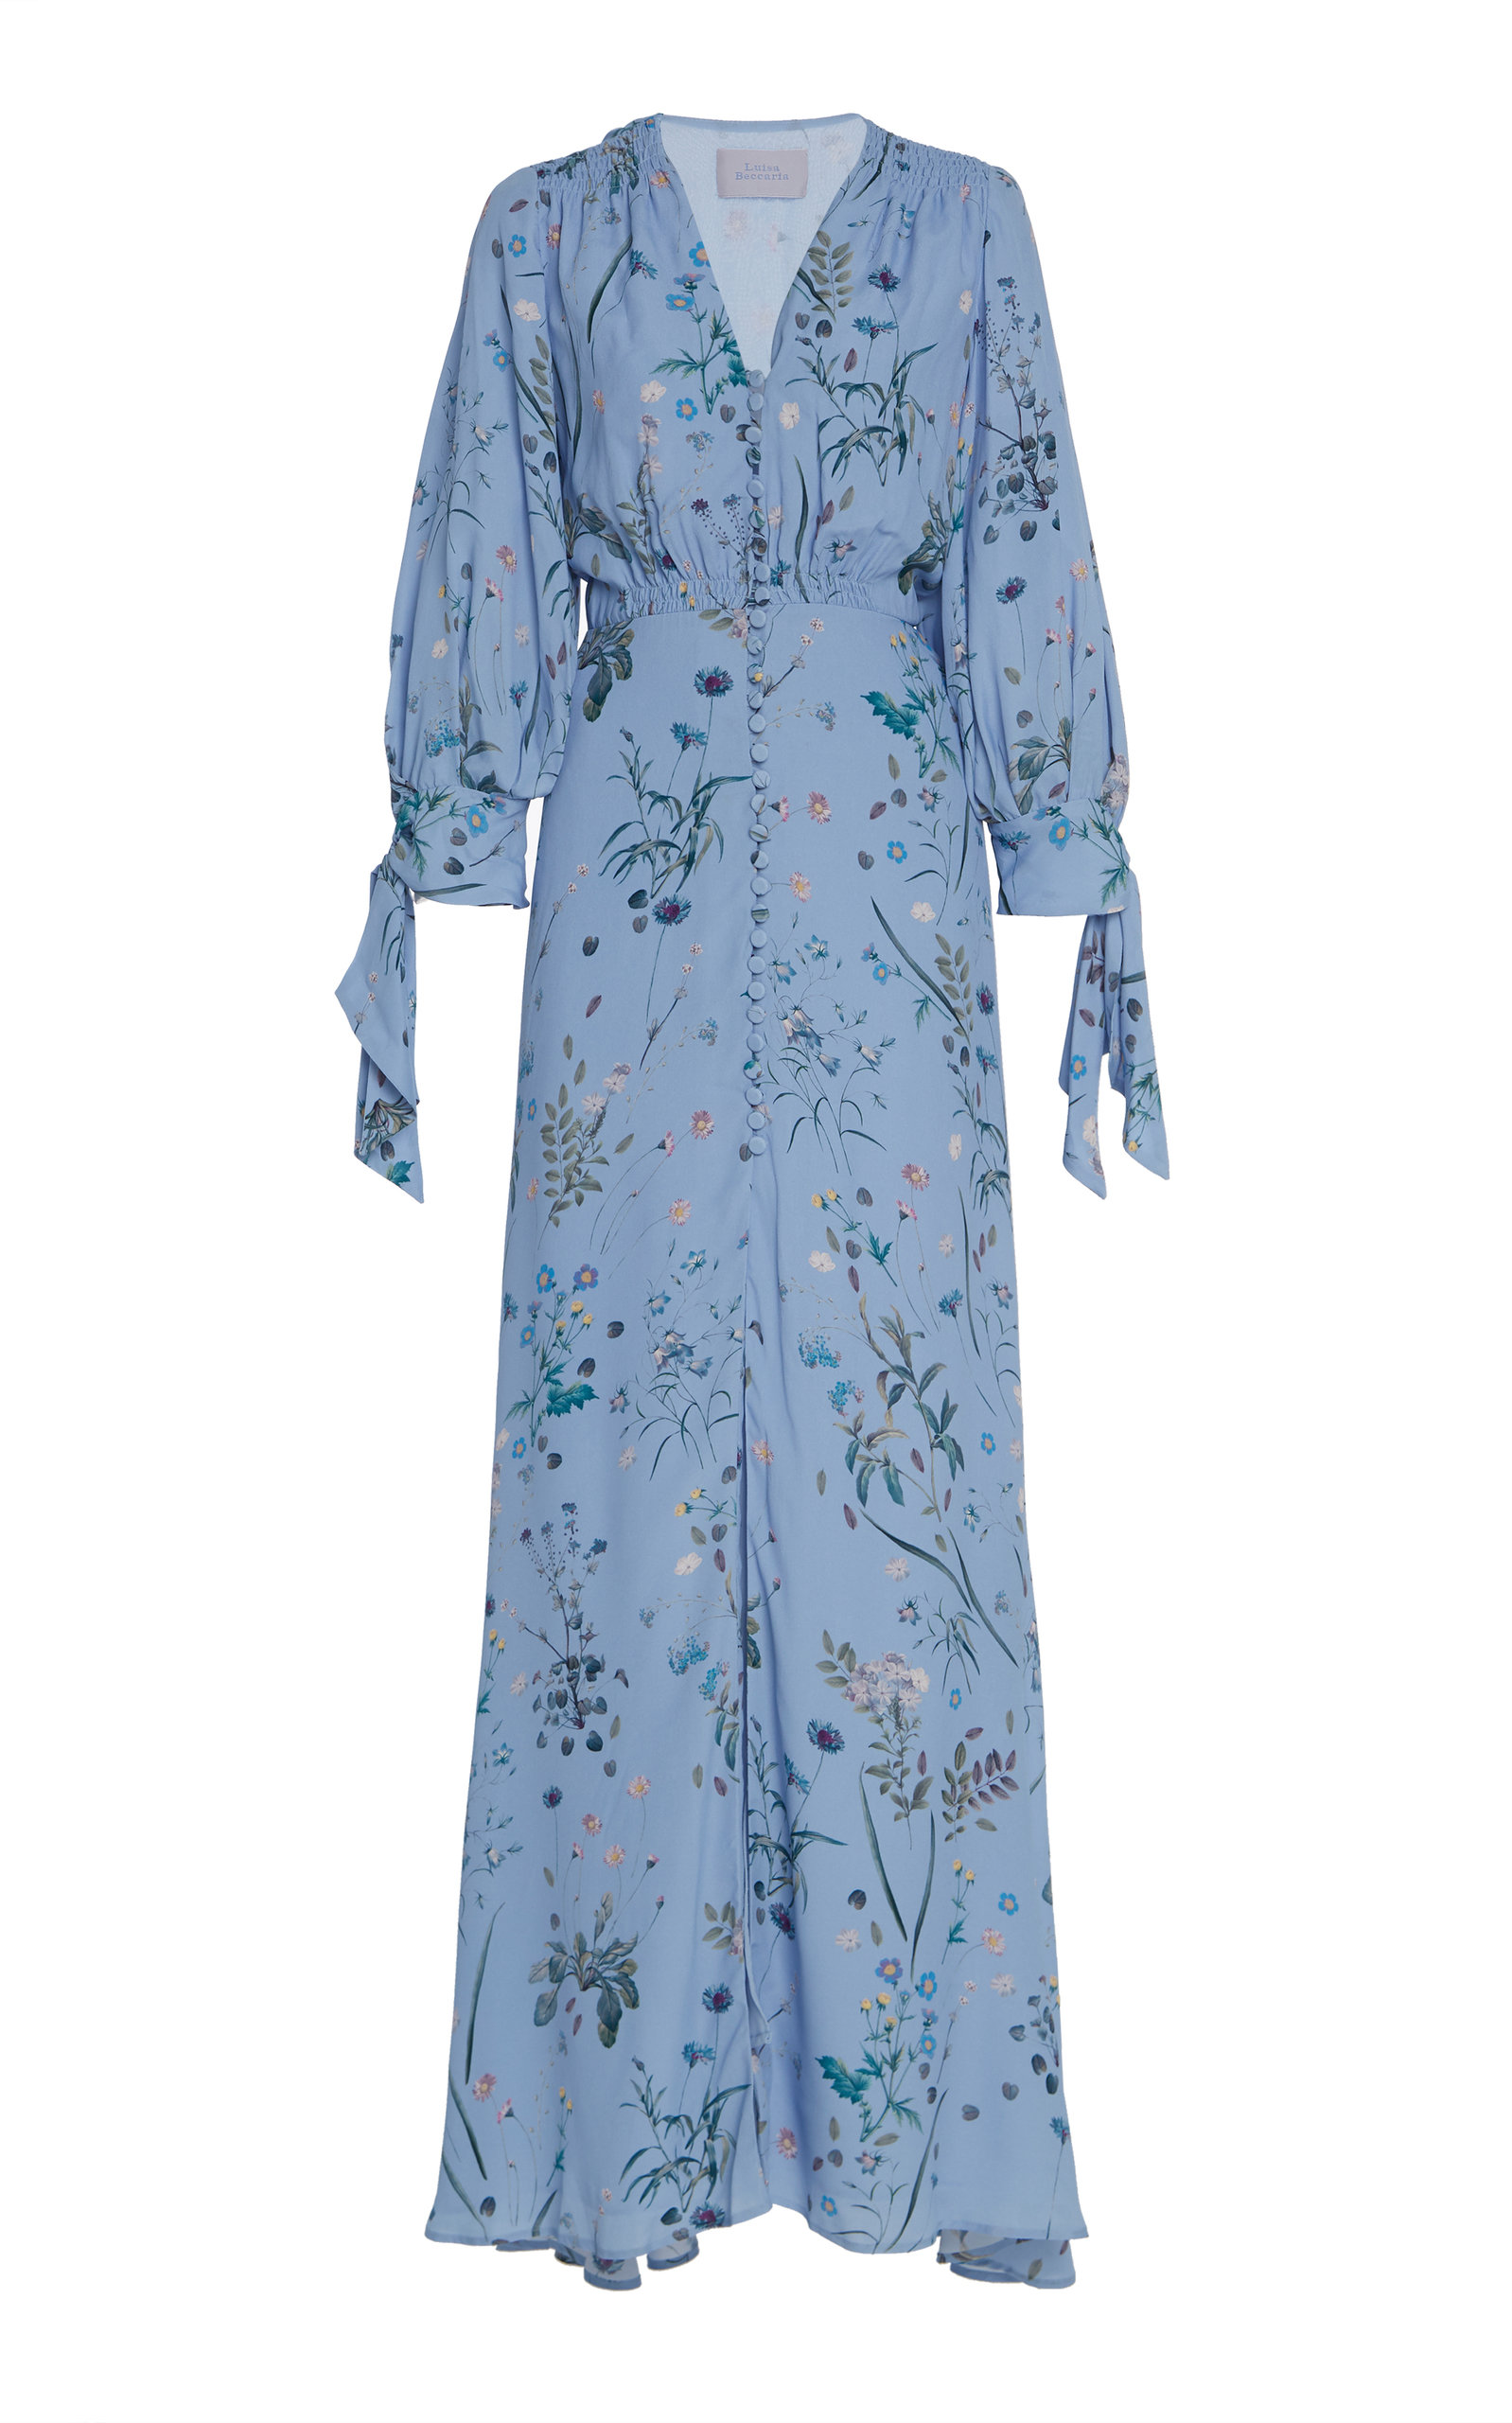 Buy Luisa Beccaria Floral-Print Crepe Maxi Dress online, shop Luisa Beccaria at the best price